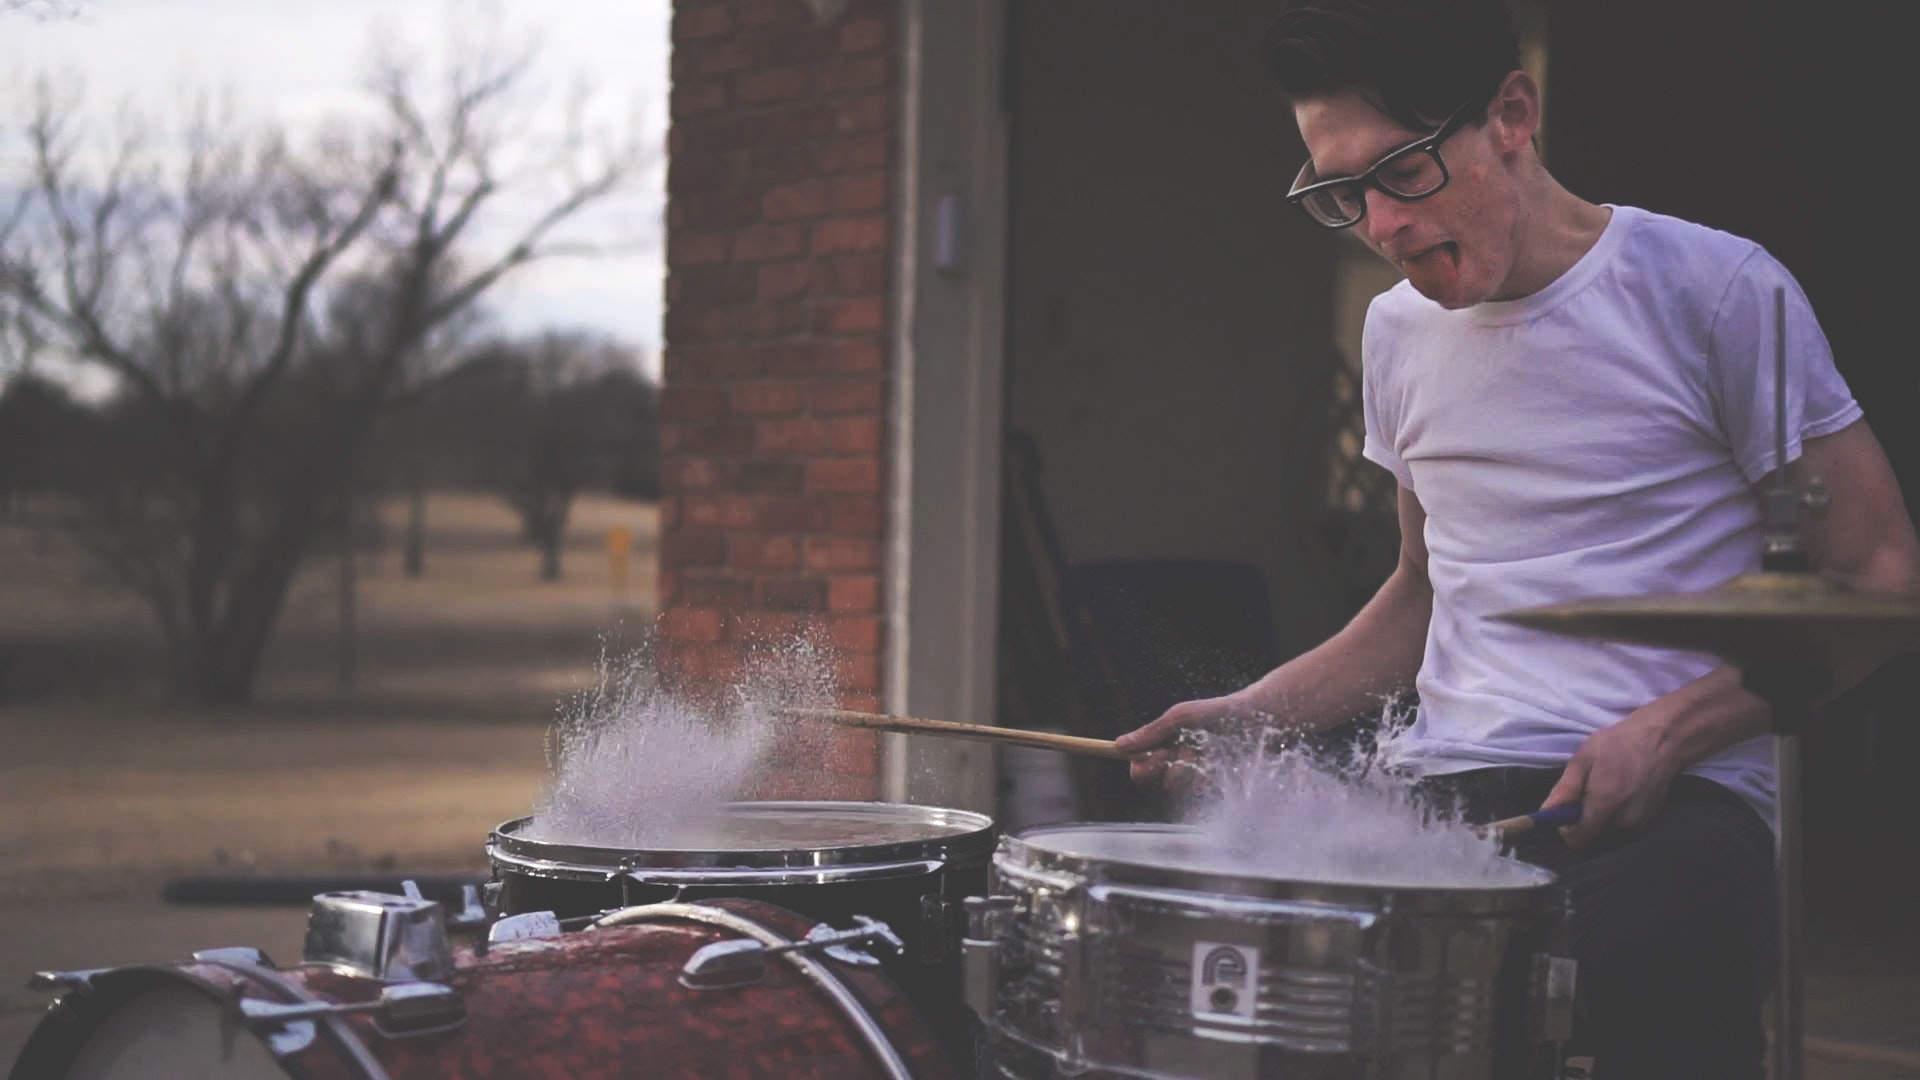 drummer-drums-drumsticks-141376.jpg